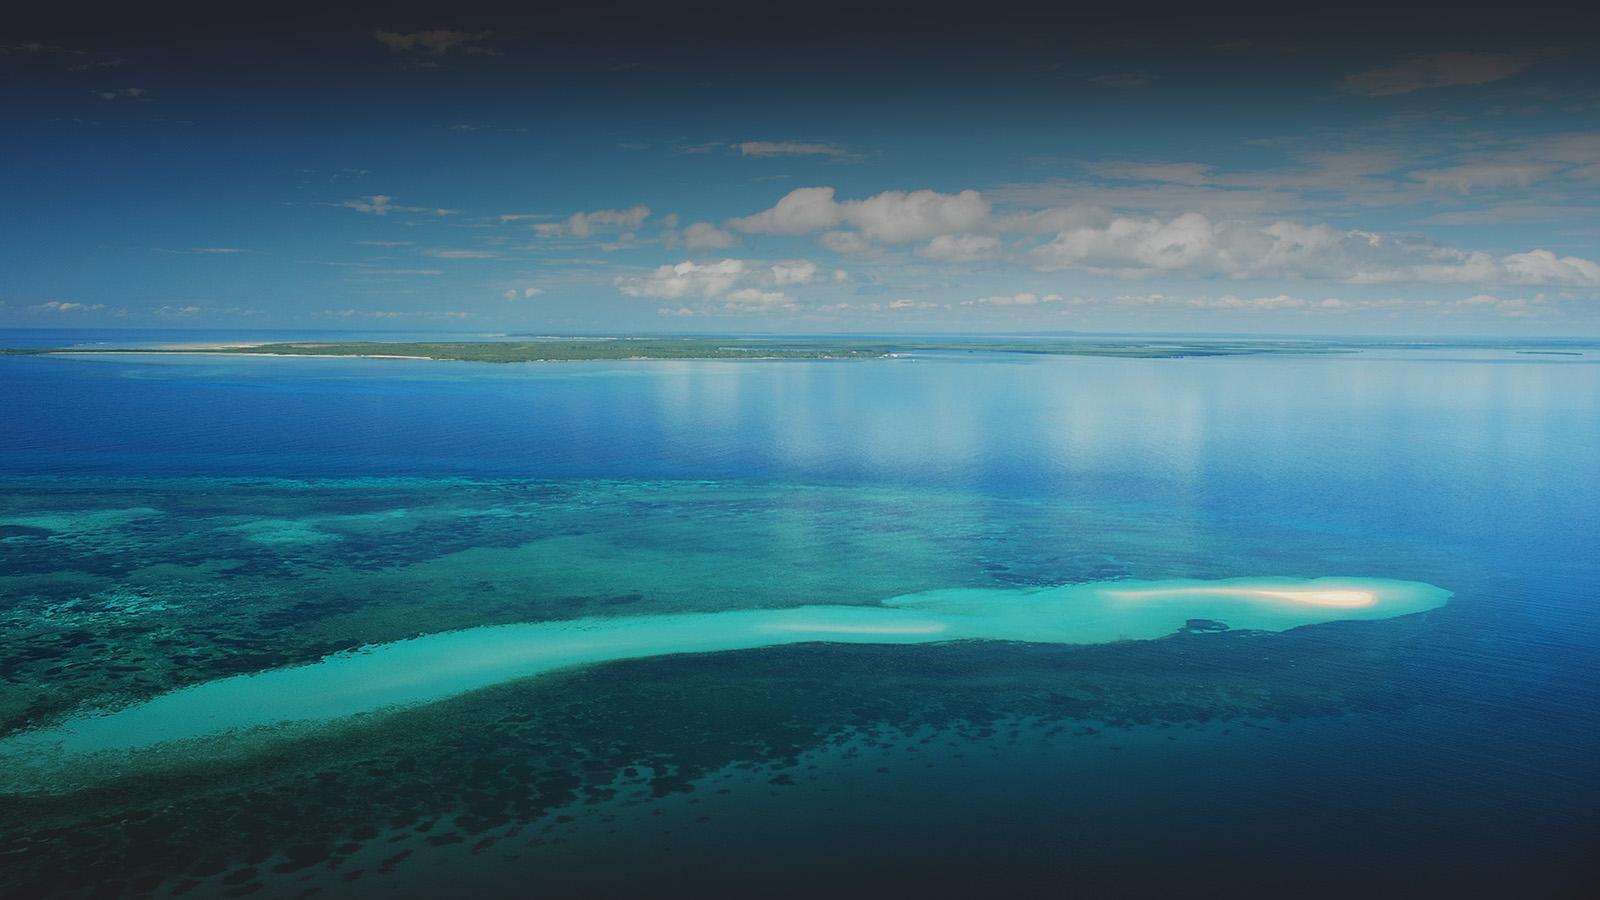 ibo island mozambique-lodges-zambia-in-style-island-quirimbas-archipelago-aerial-sandbank-corals